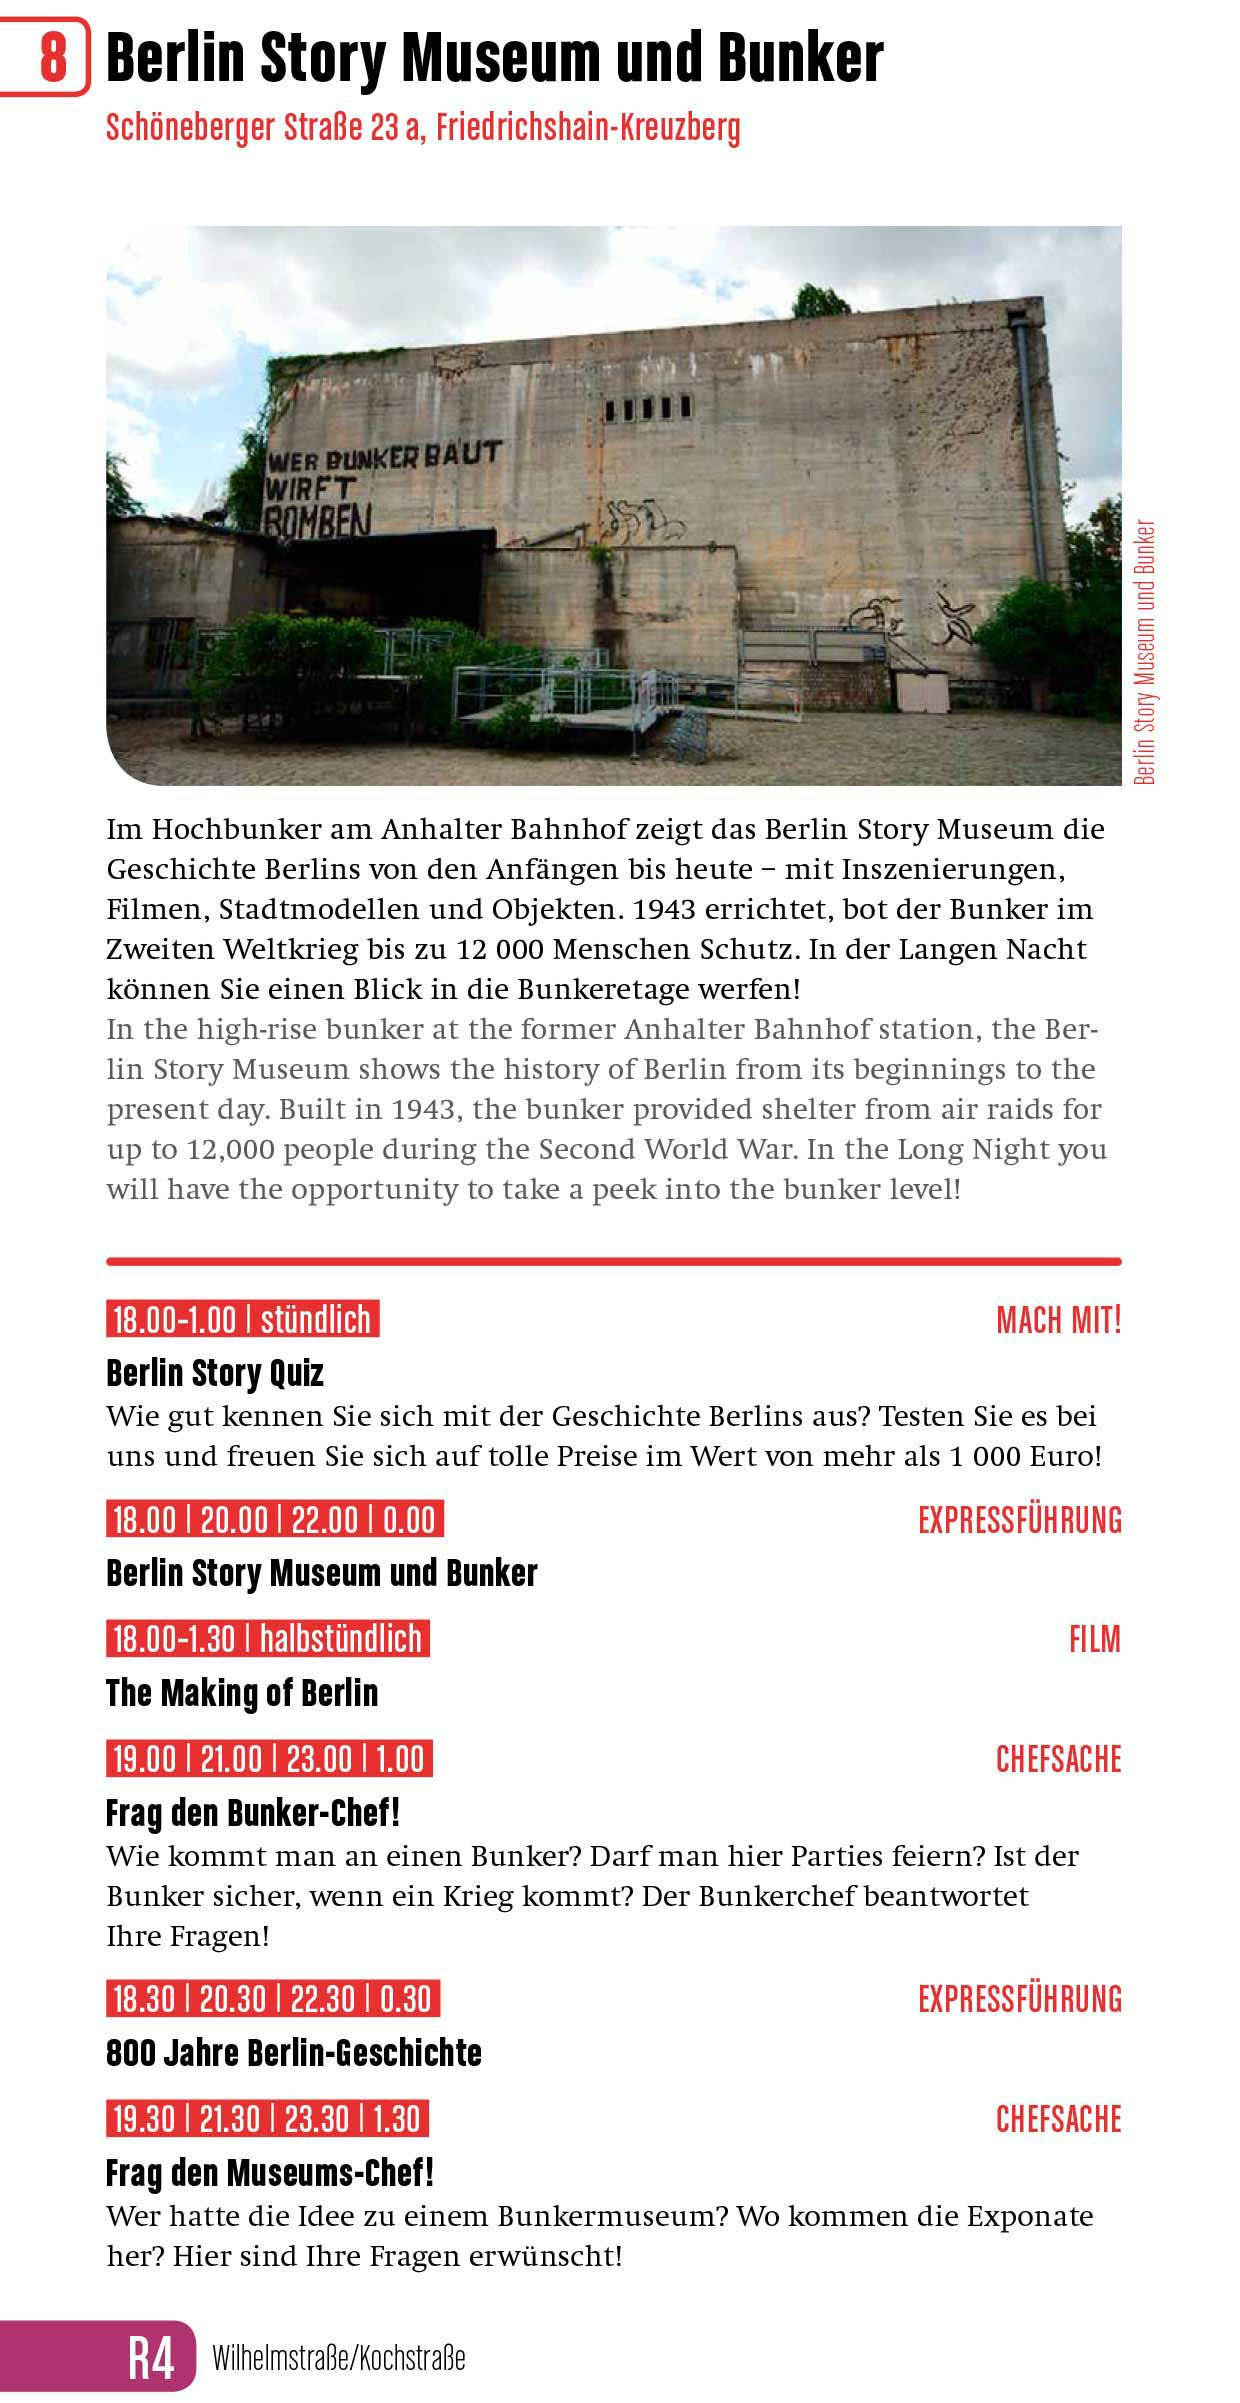 LNDM_PH_Programm_Berlin_Story_Museum-1